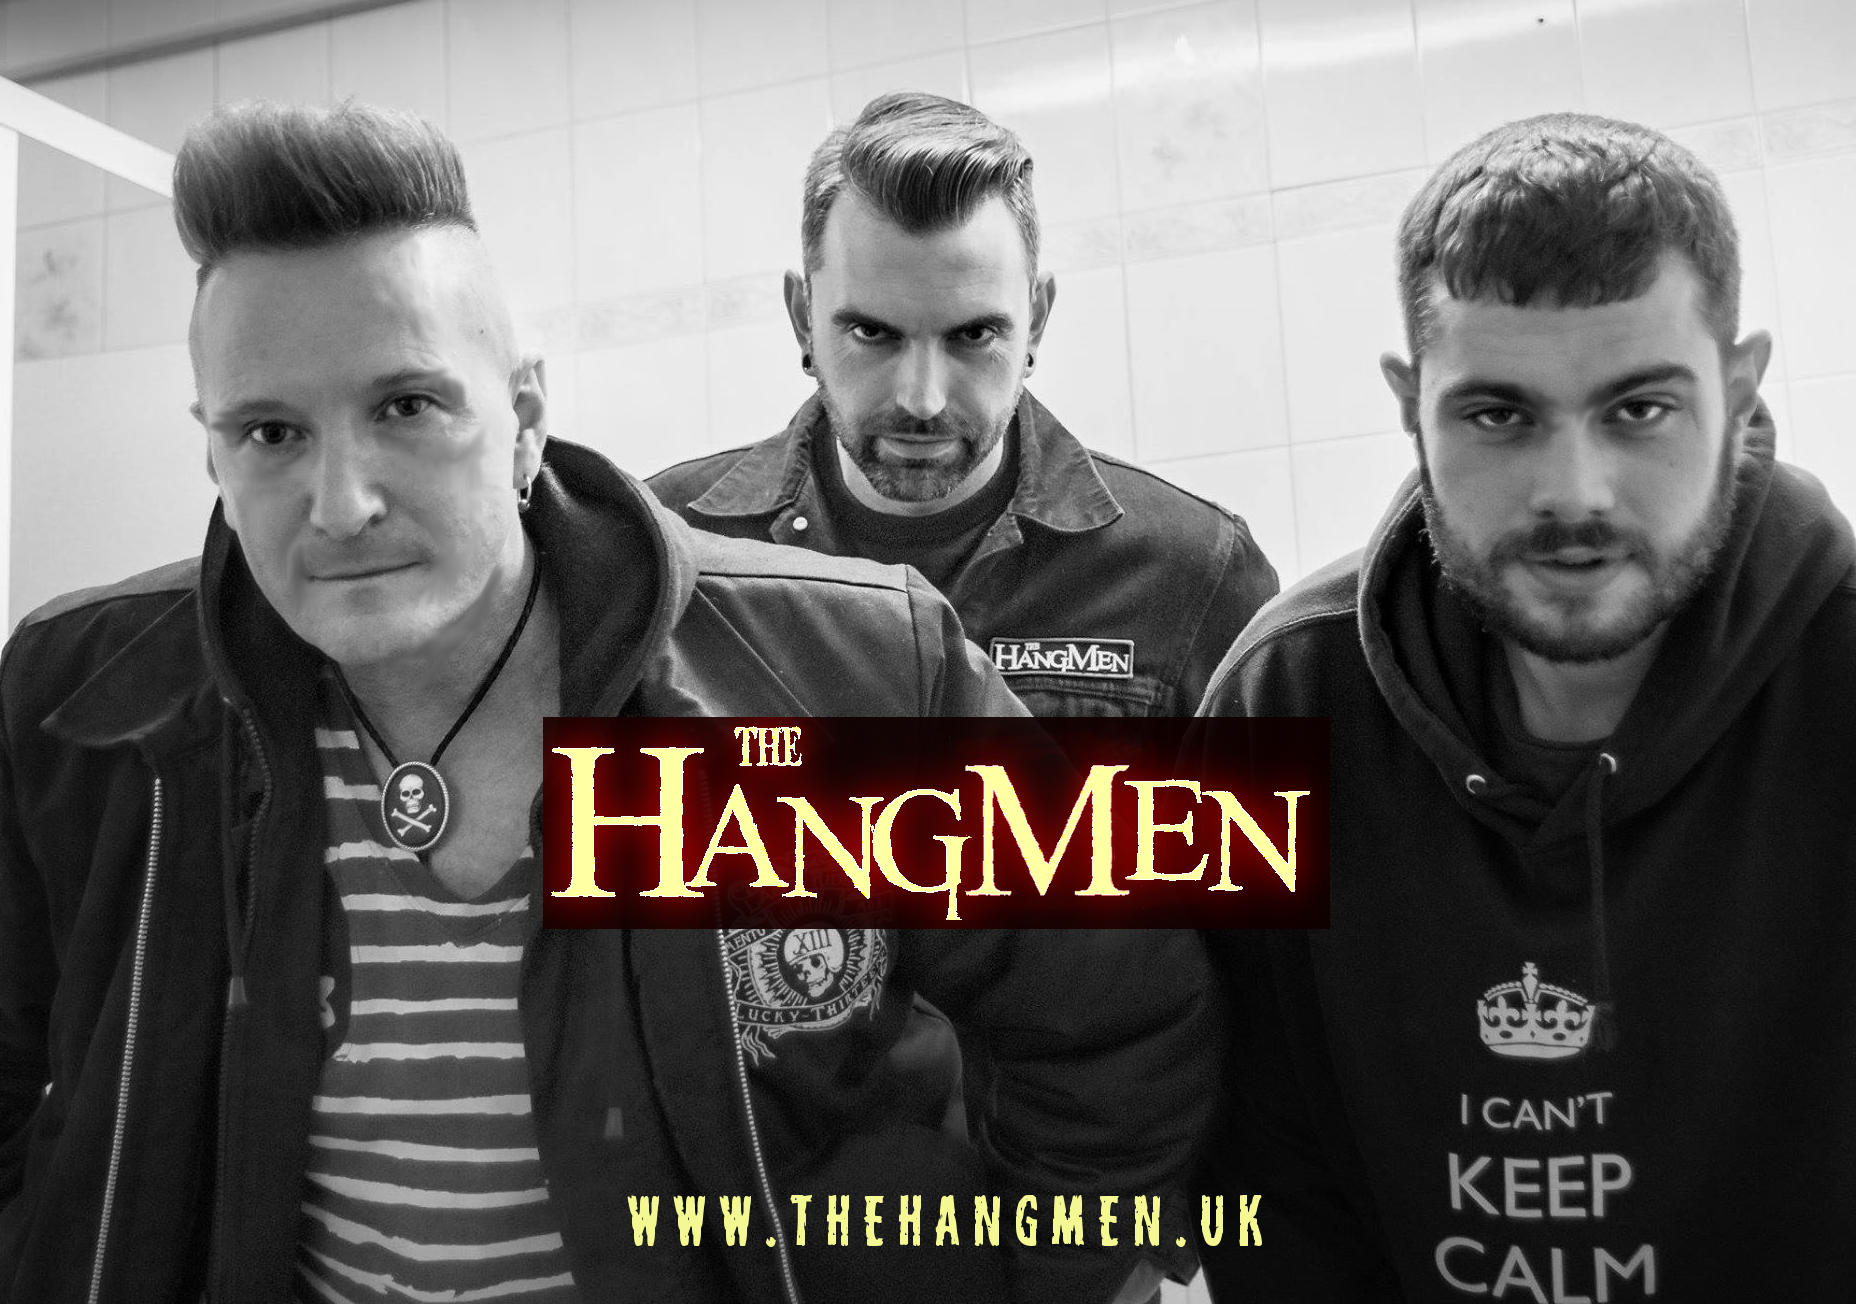 The Hangmen band promo shot